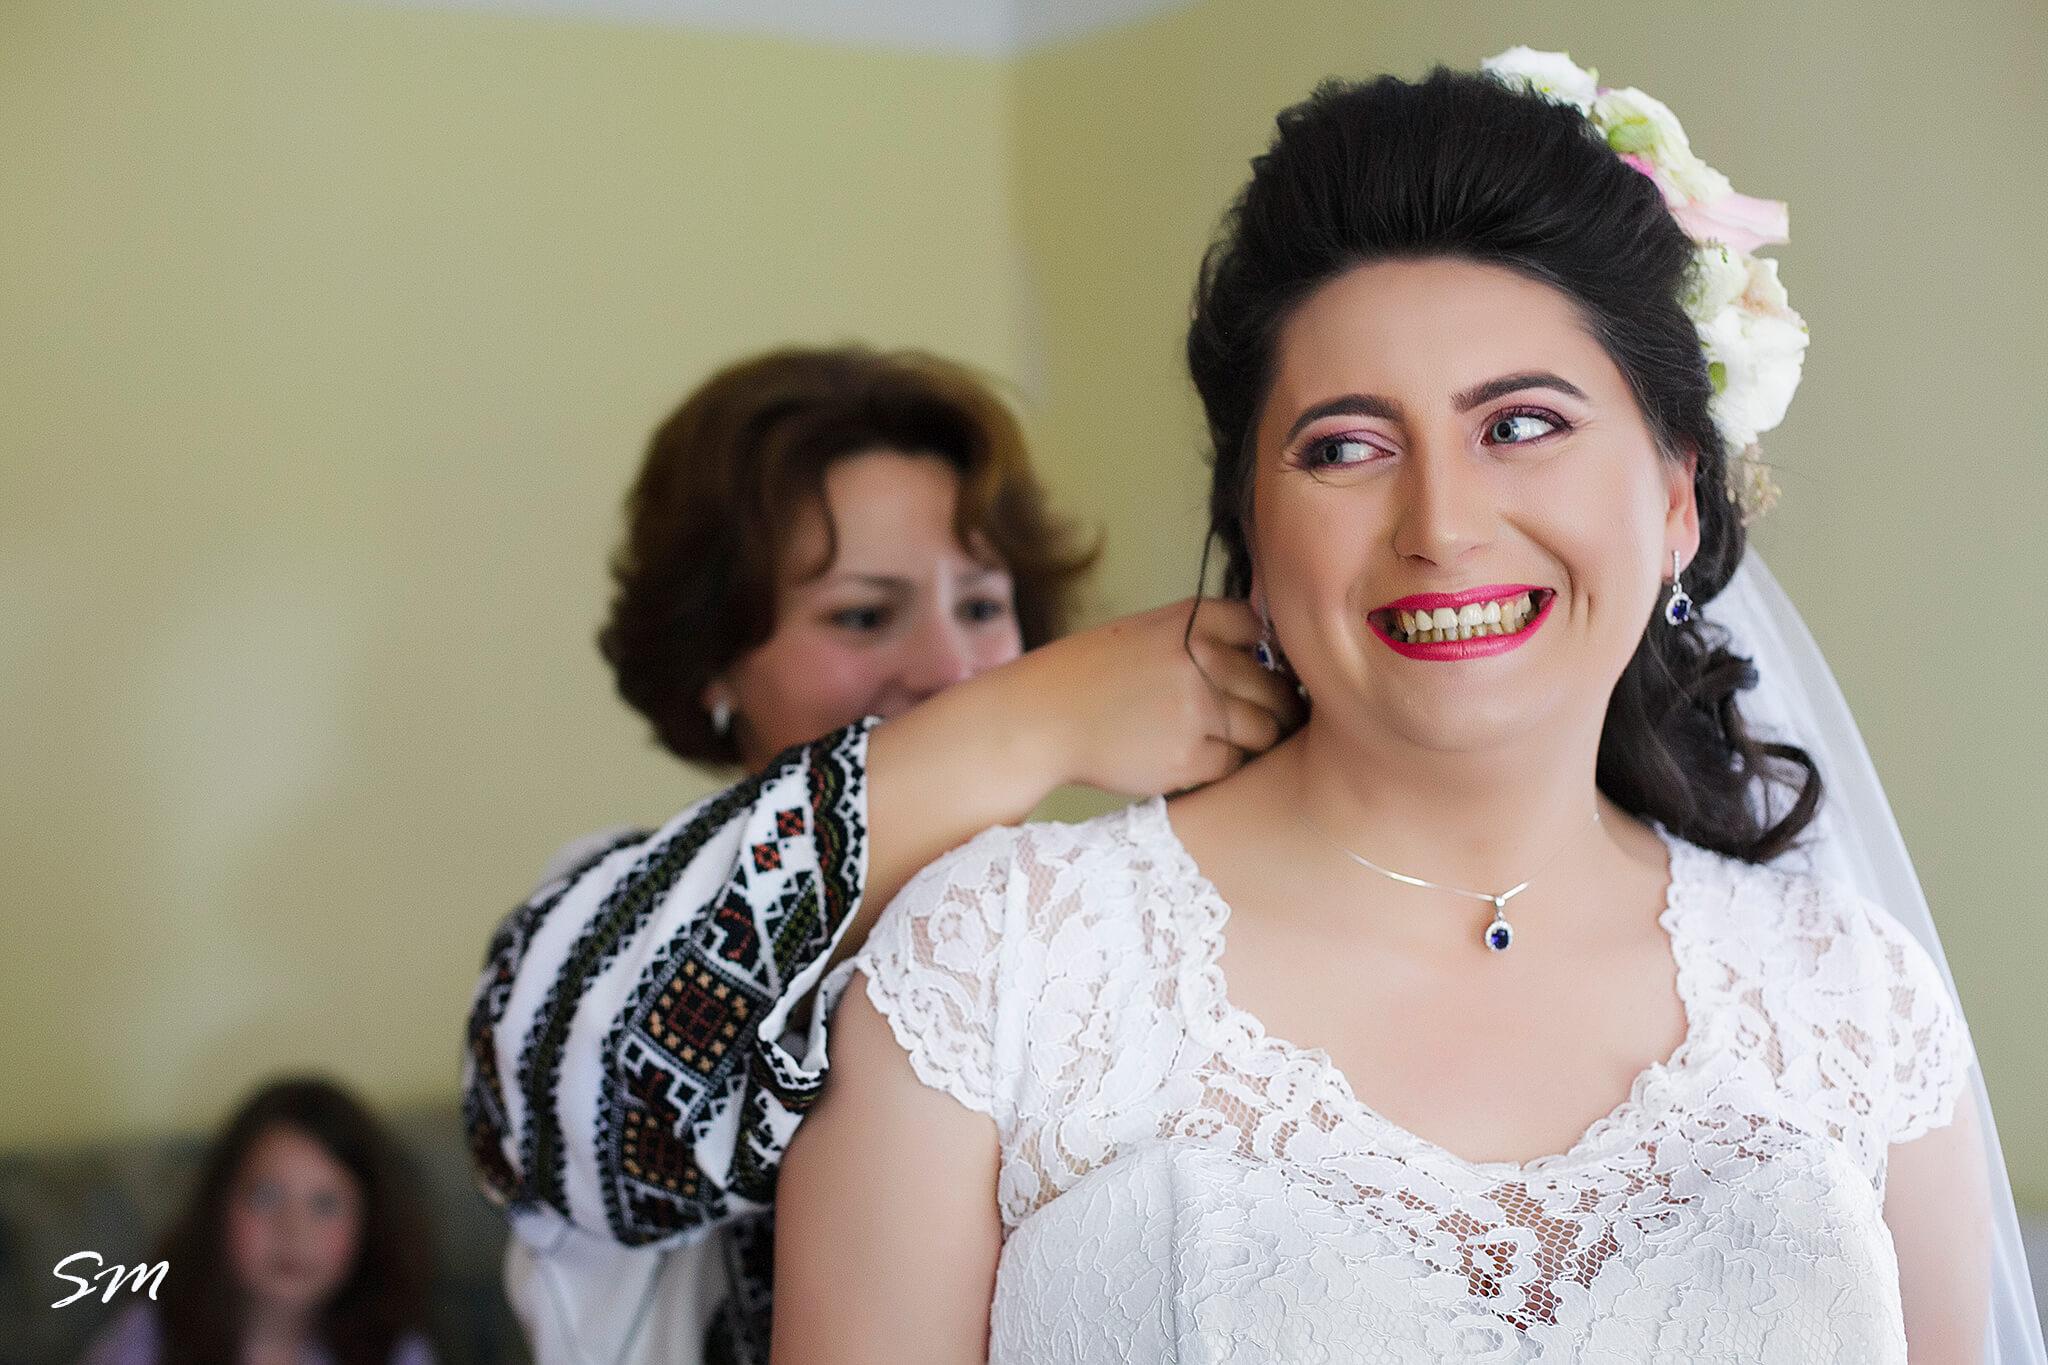 fotograf_nunta_profesionist_suceava (4)